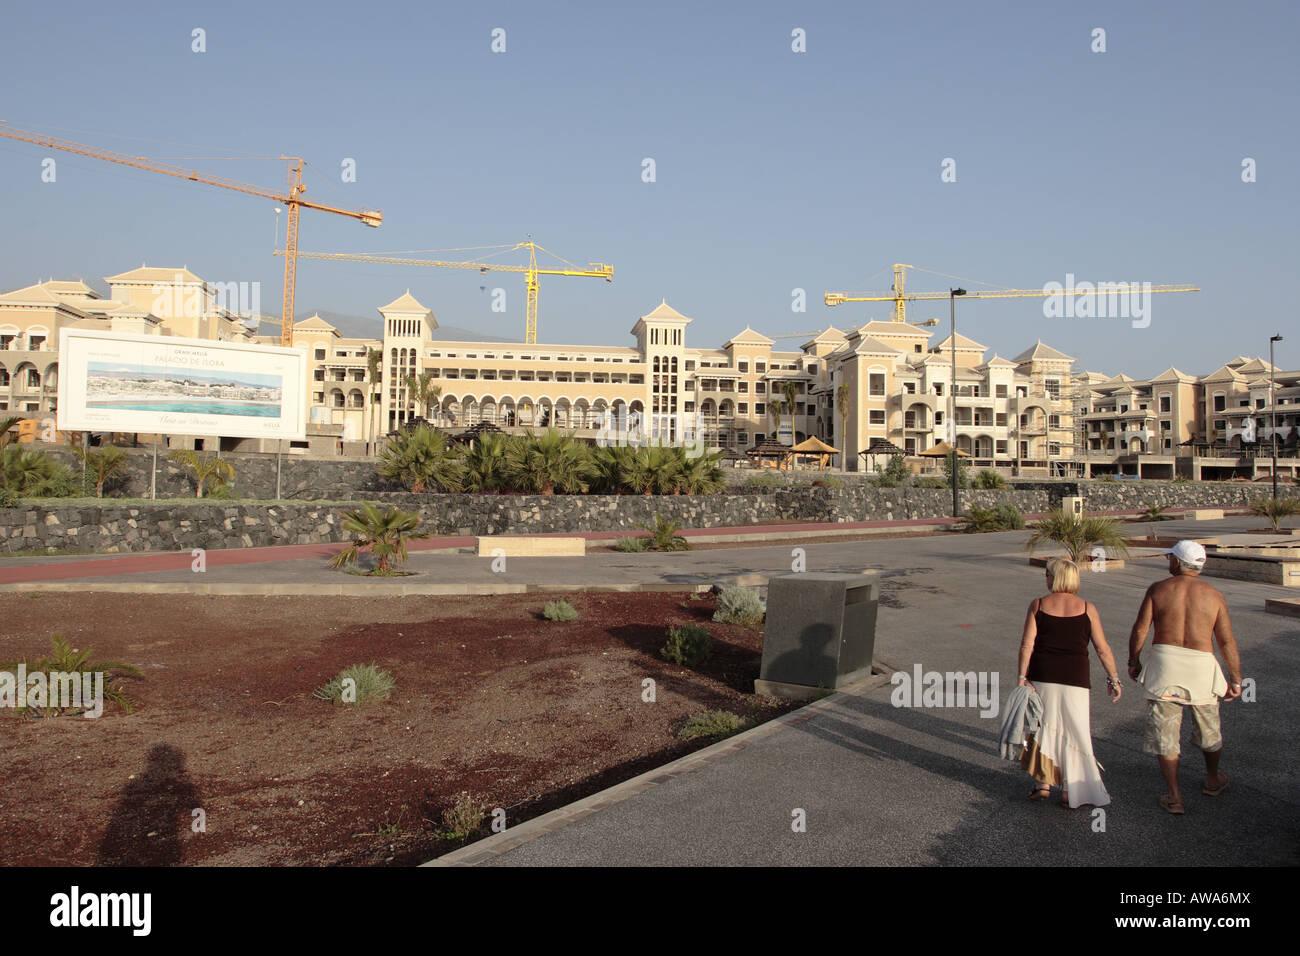 The new gran melia hotel palacio de isora in alcala guia - Guia de tenerife pdf ...